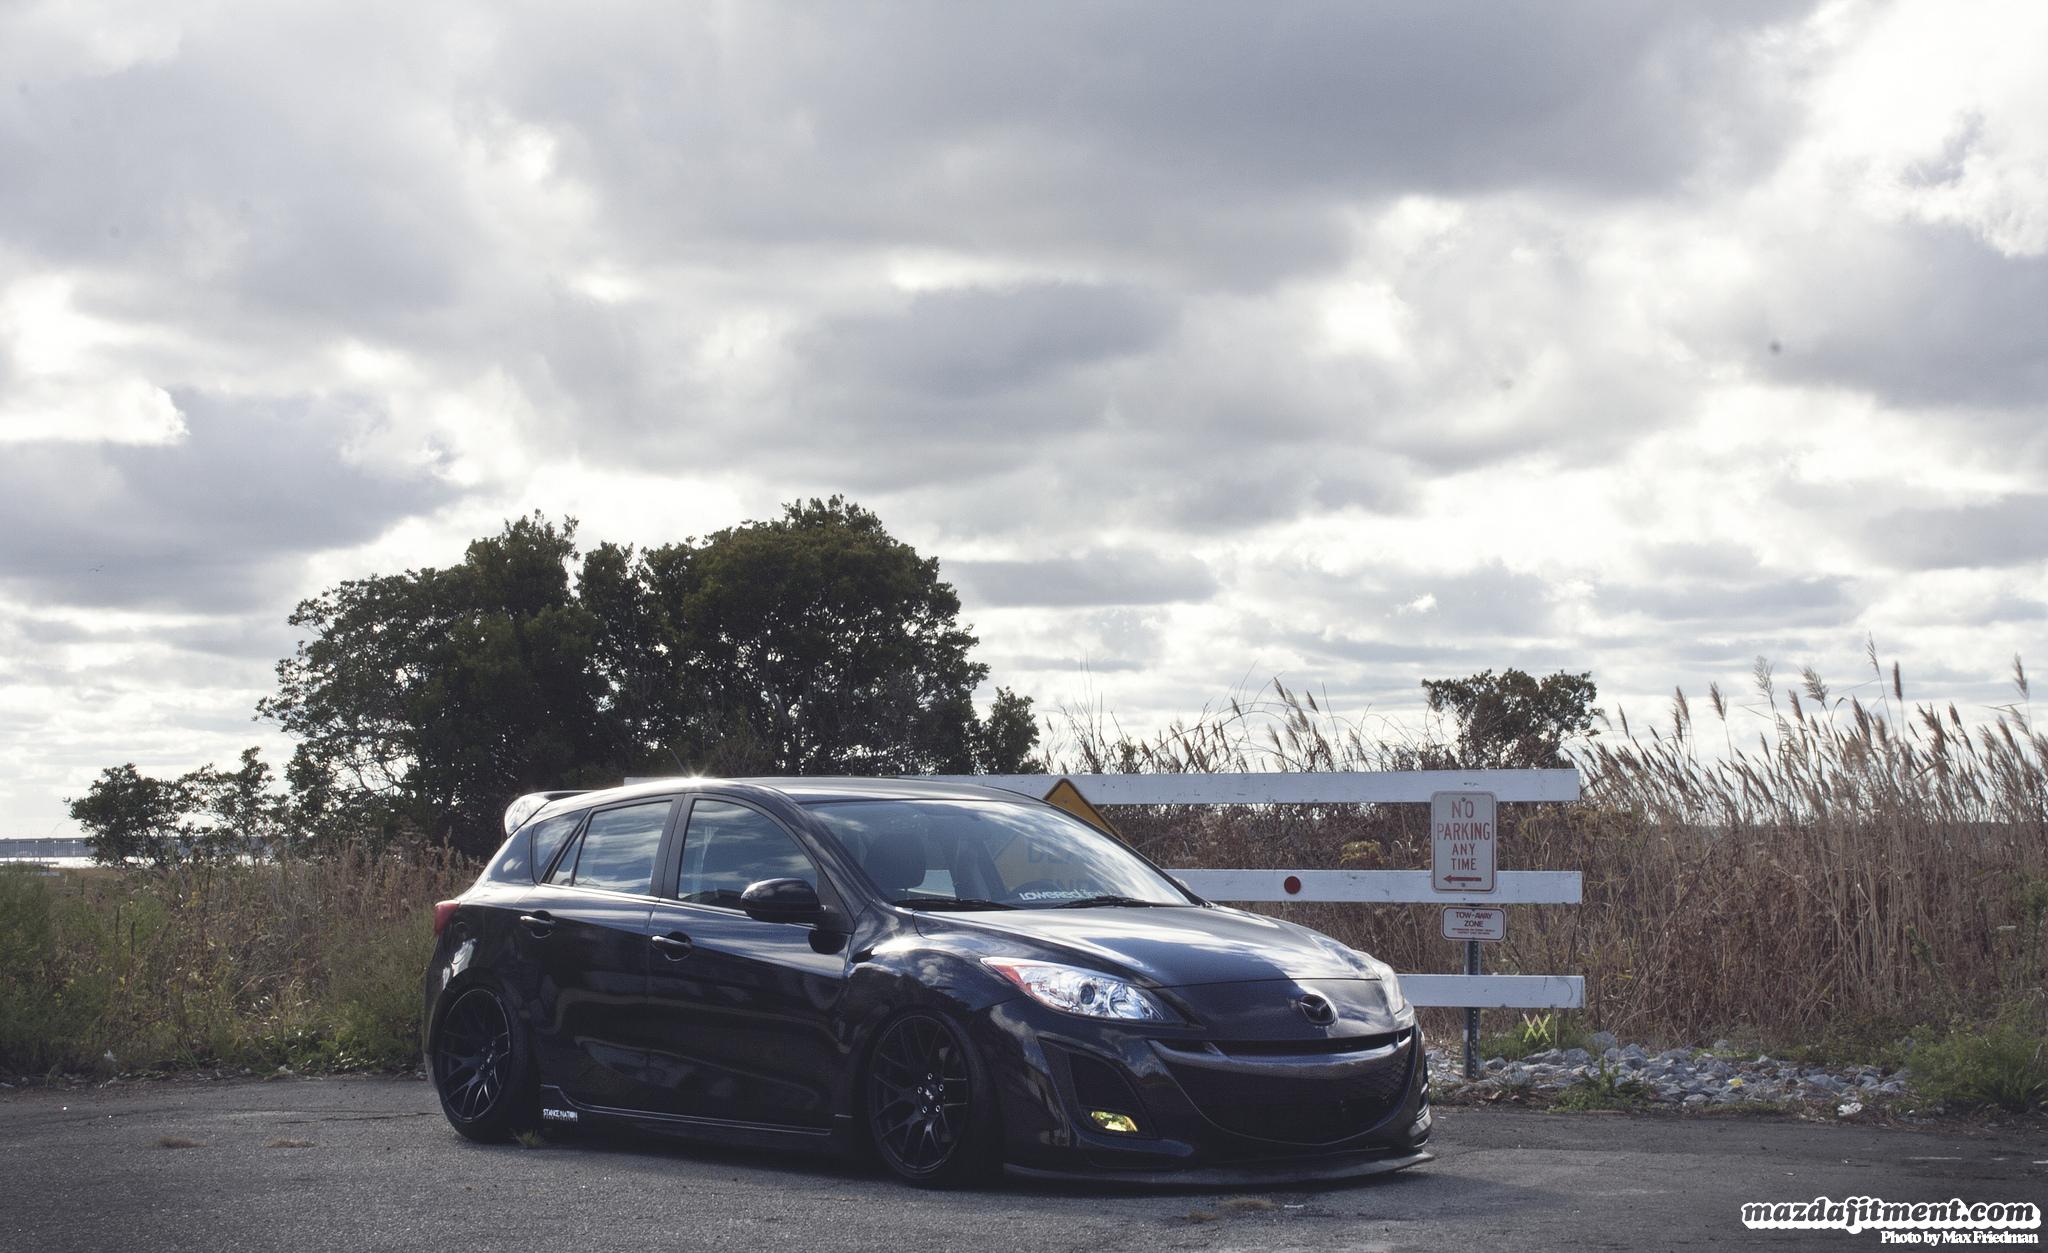 Mazda Fitment Freshest Mazdas In The World